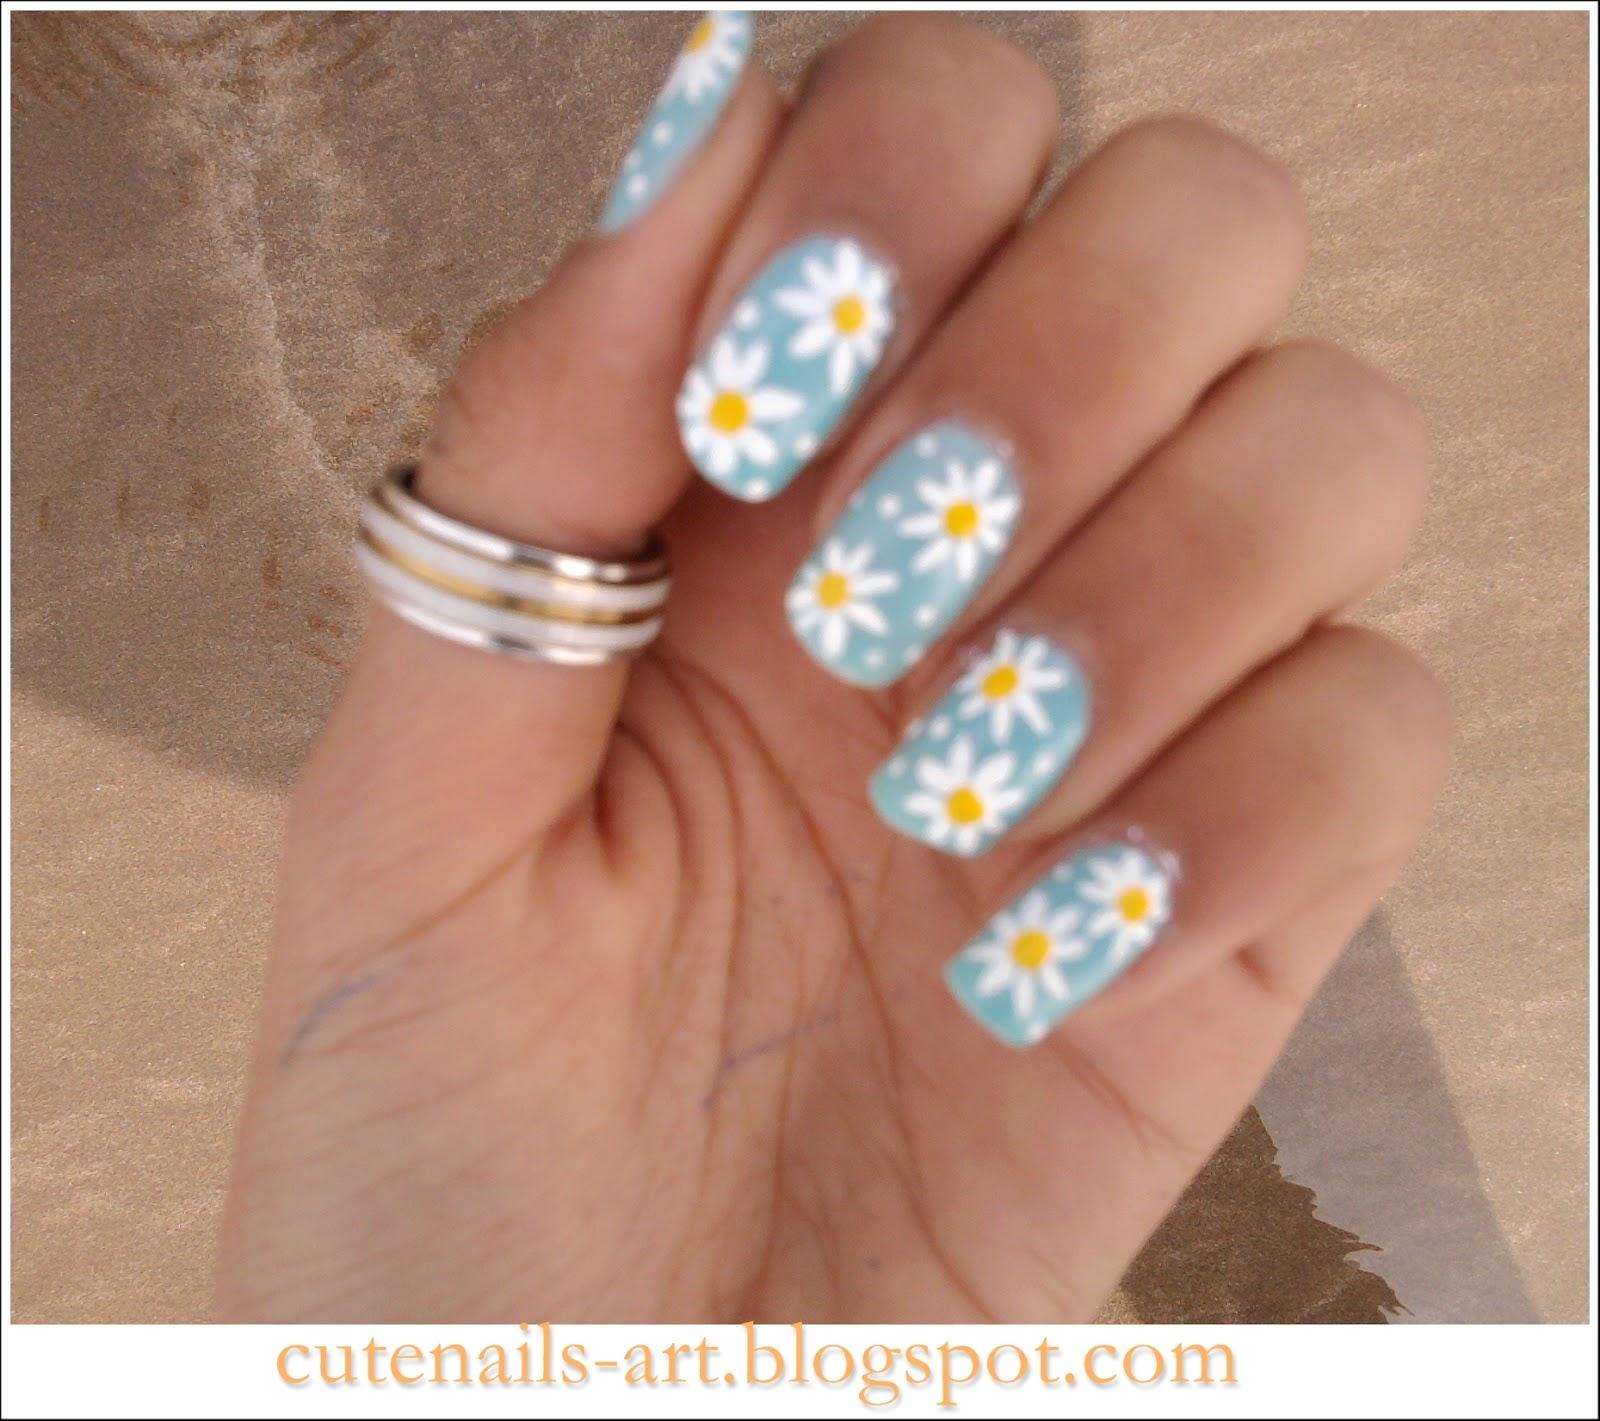 cutenails-art: spring nails art : Daisy flowers